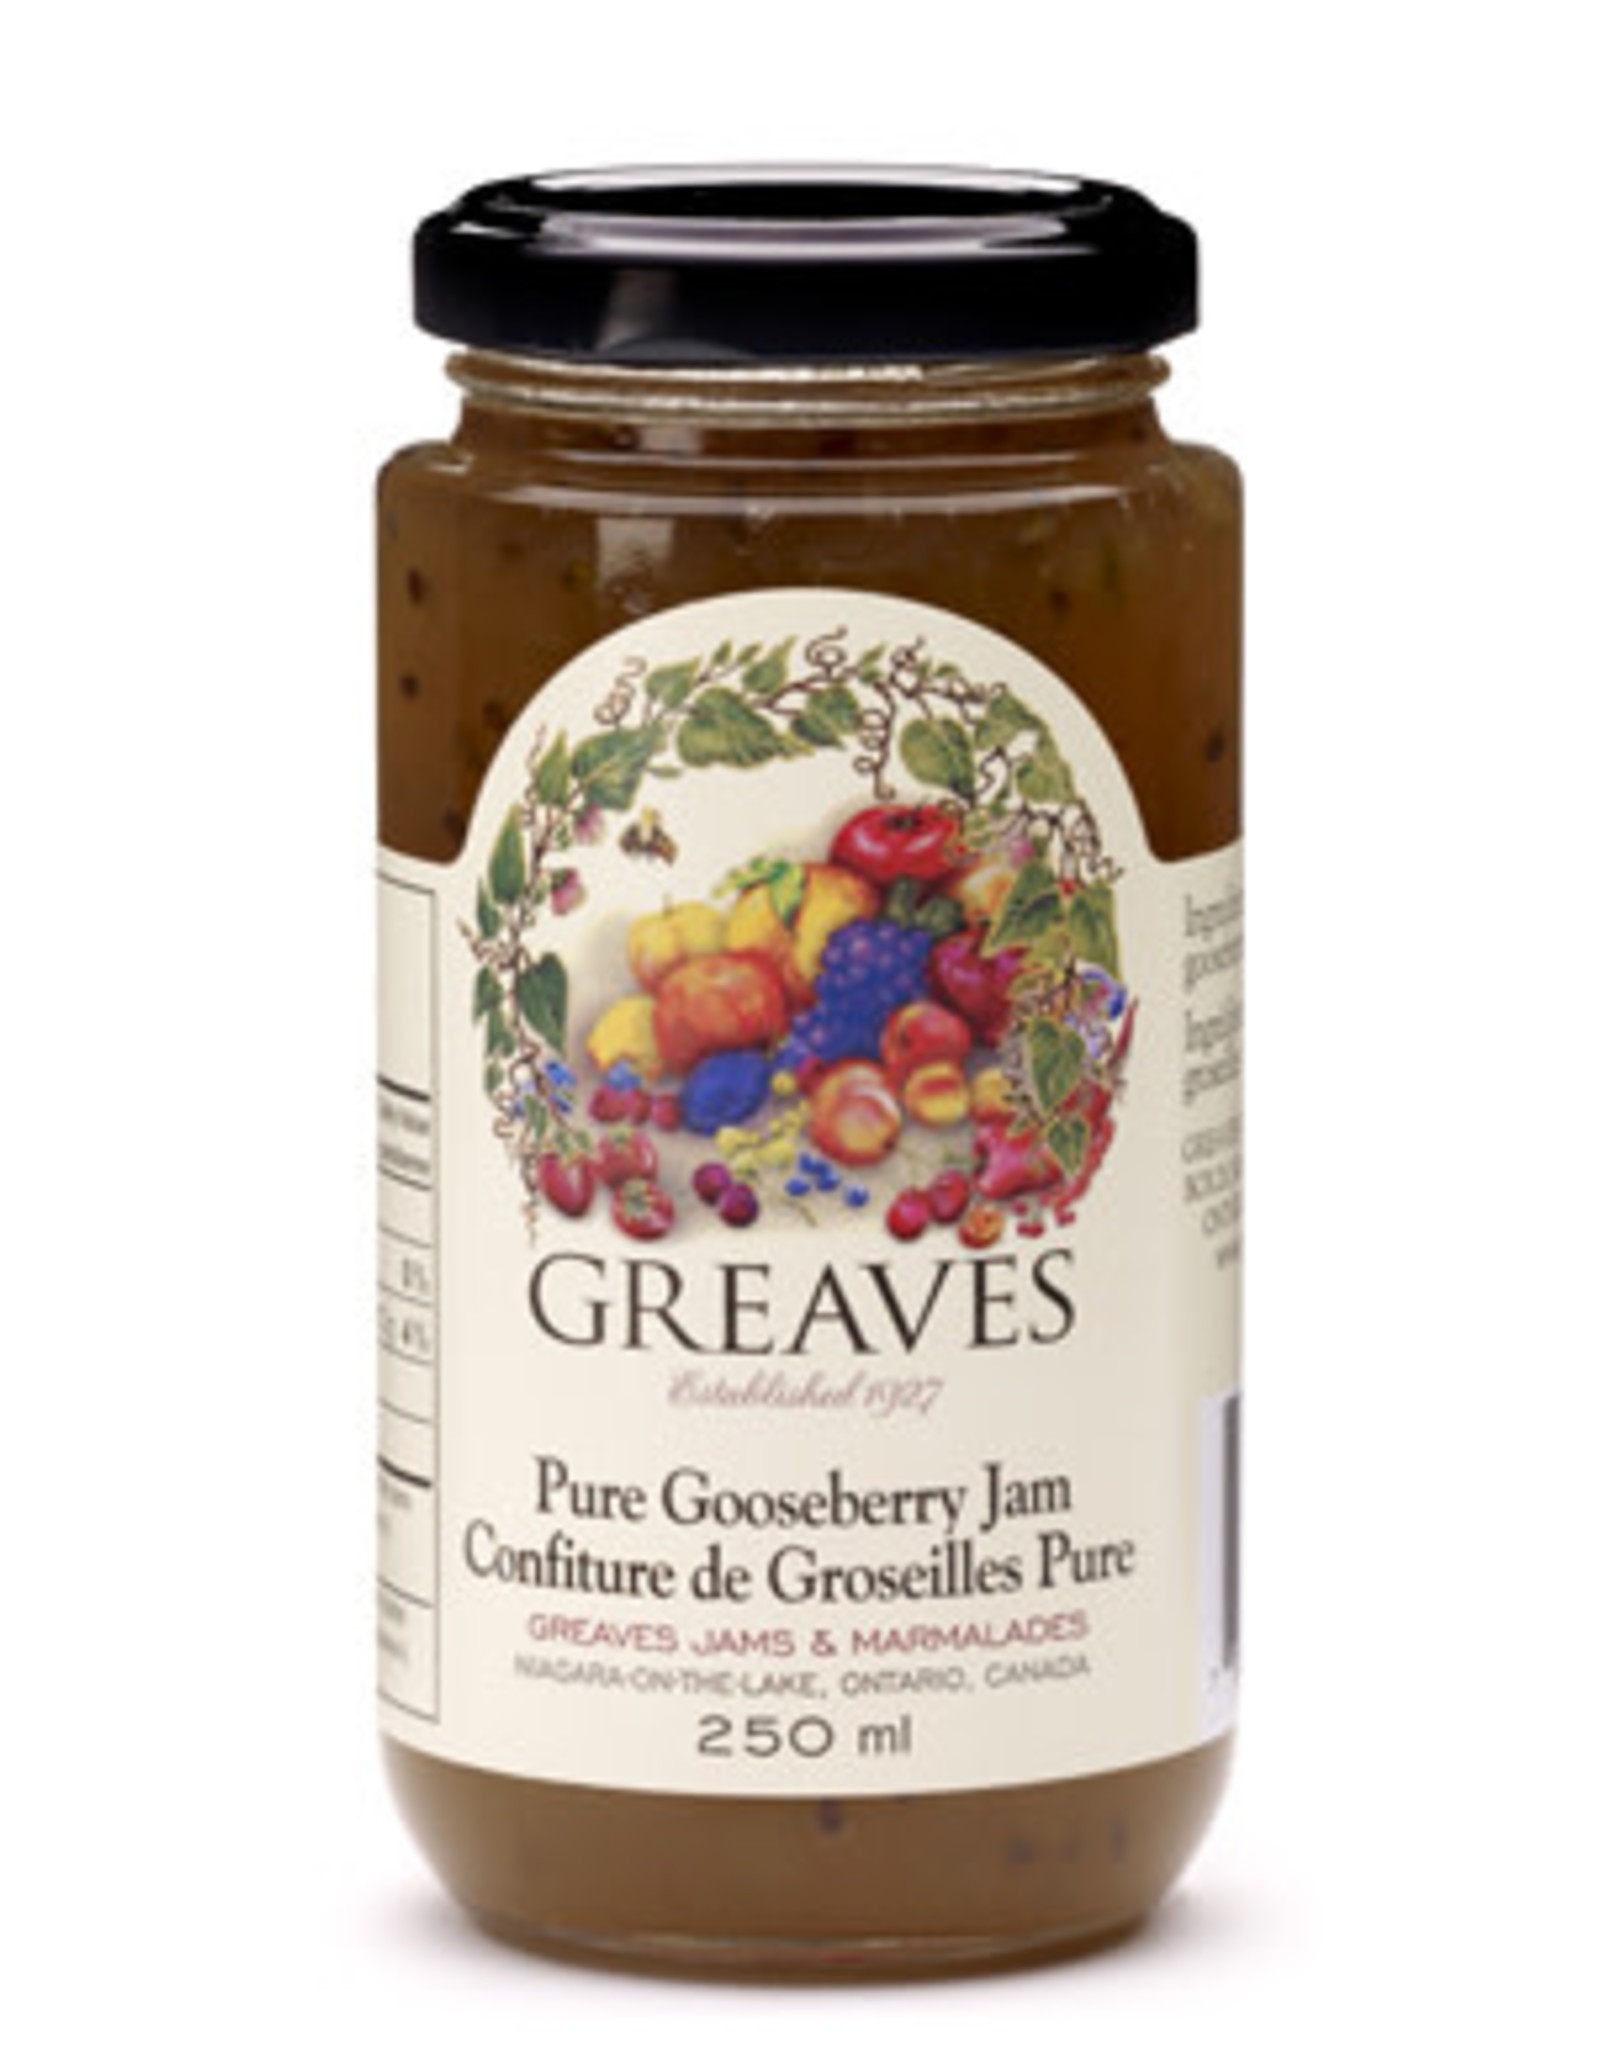 Greaves Jams & Marmalades Ltd. Greaves, Gooseberry Jam, 250ml